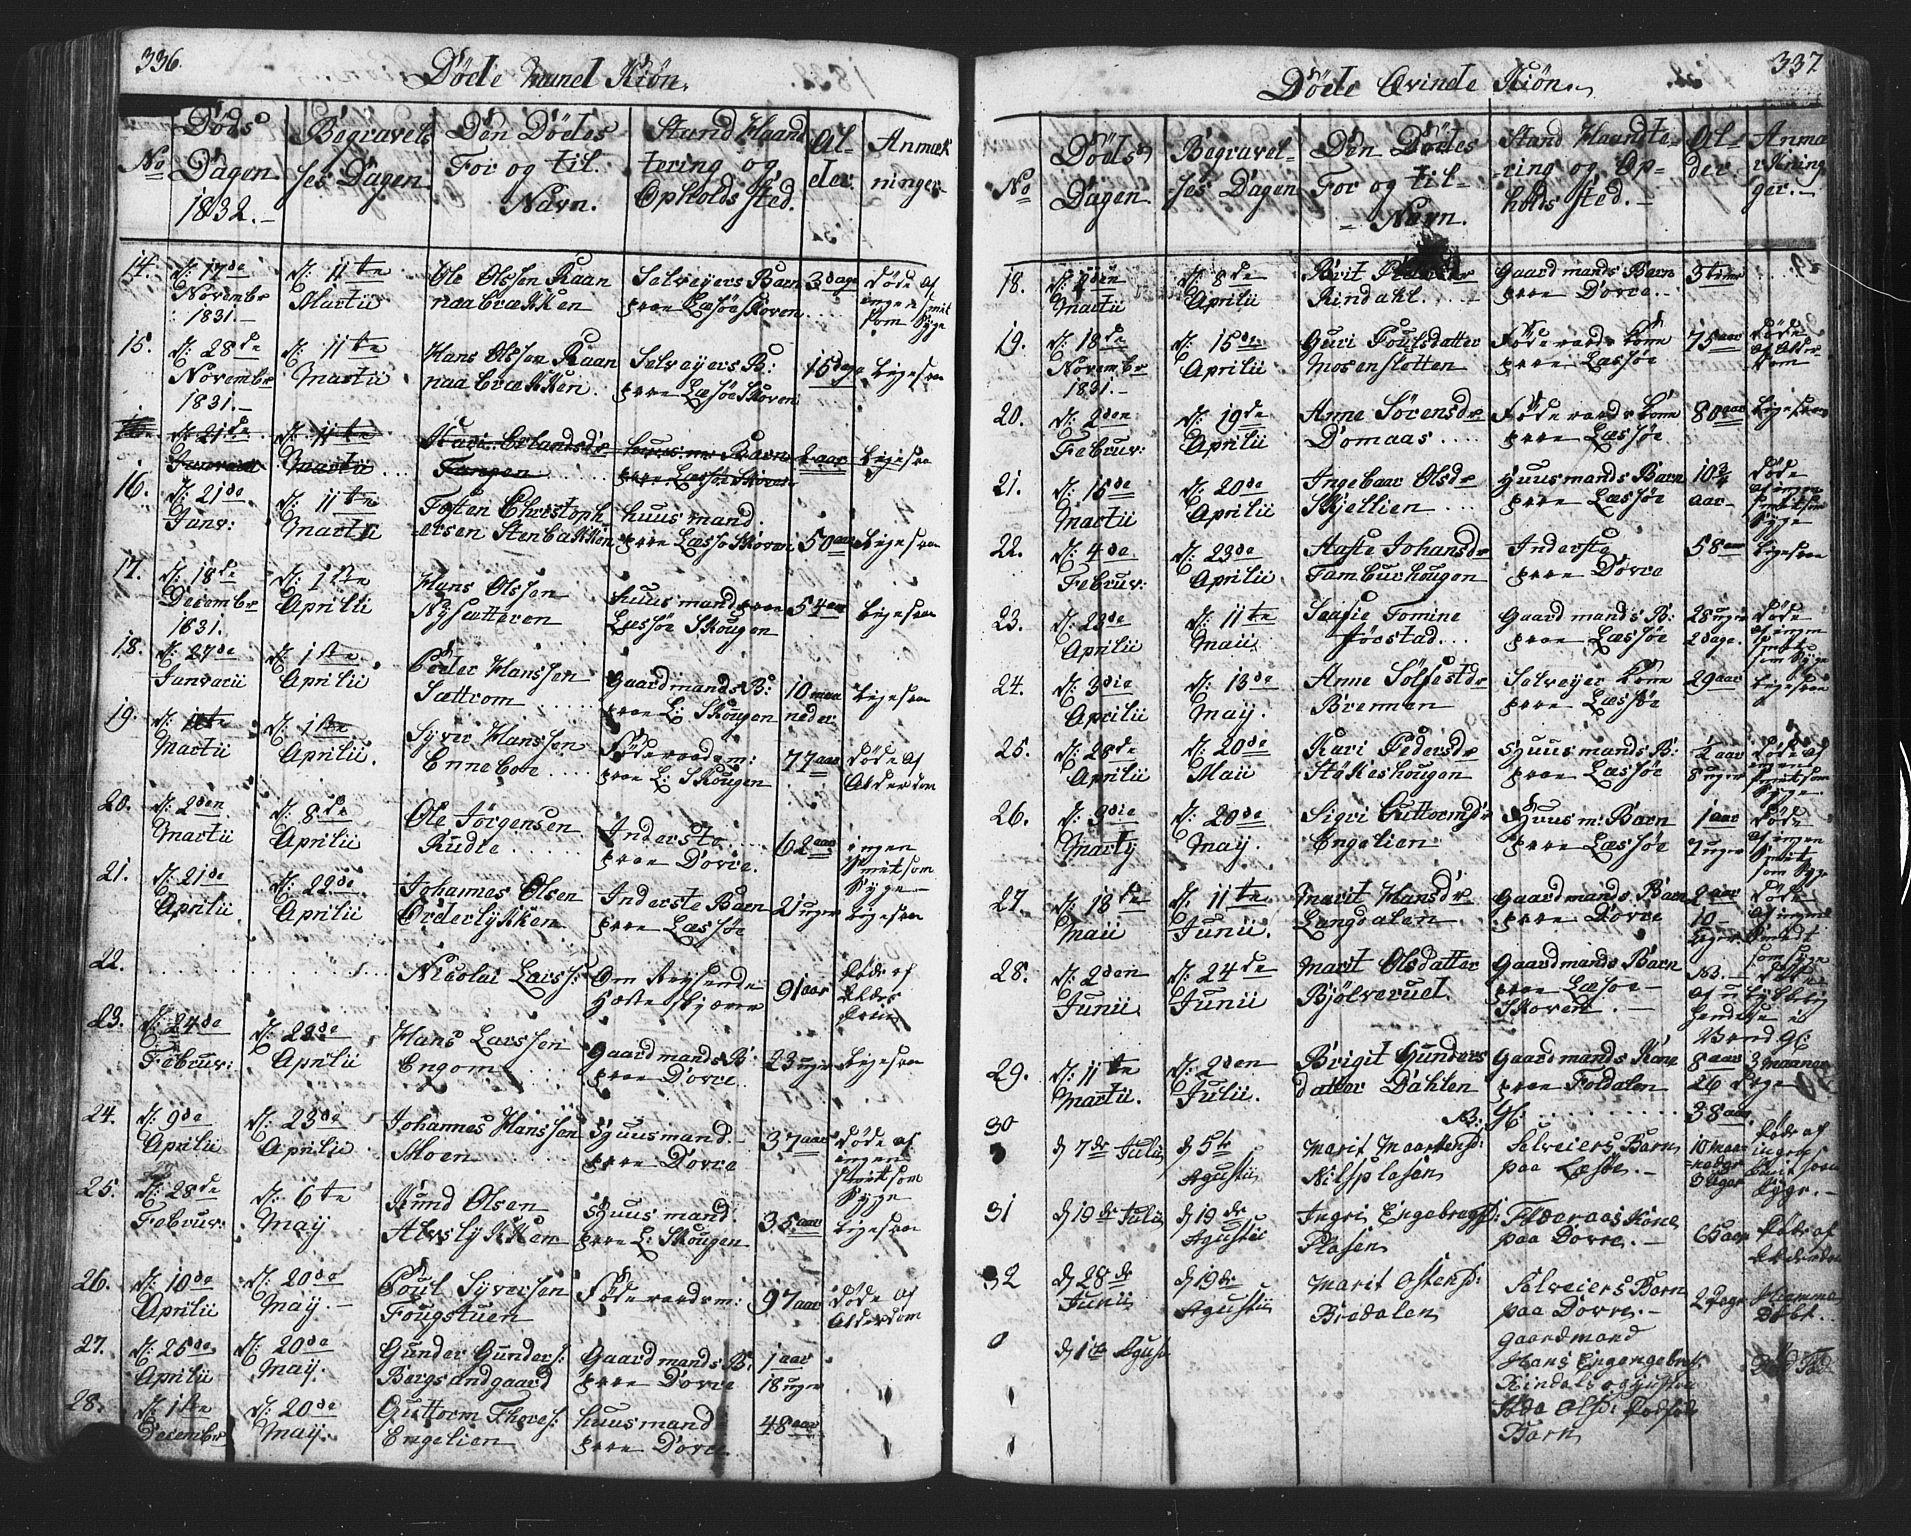 SAH, Lesja prestekontor, Klokkerbok nr. 2, 1832-1850, s. 336-337